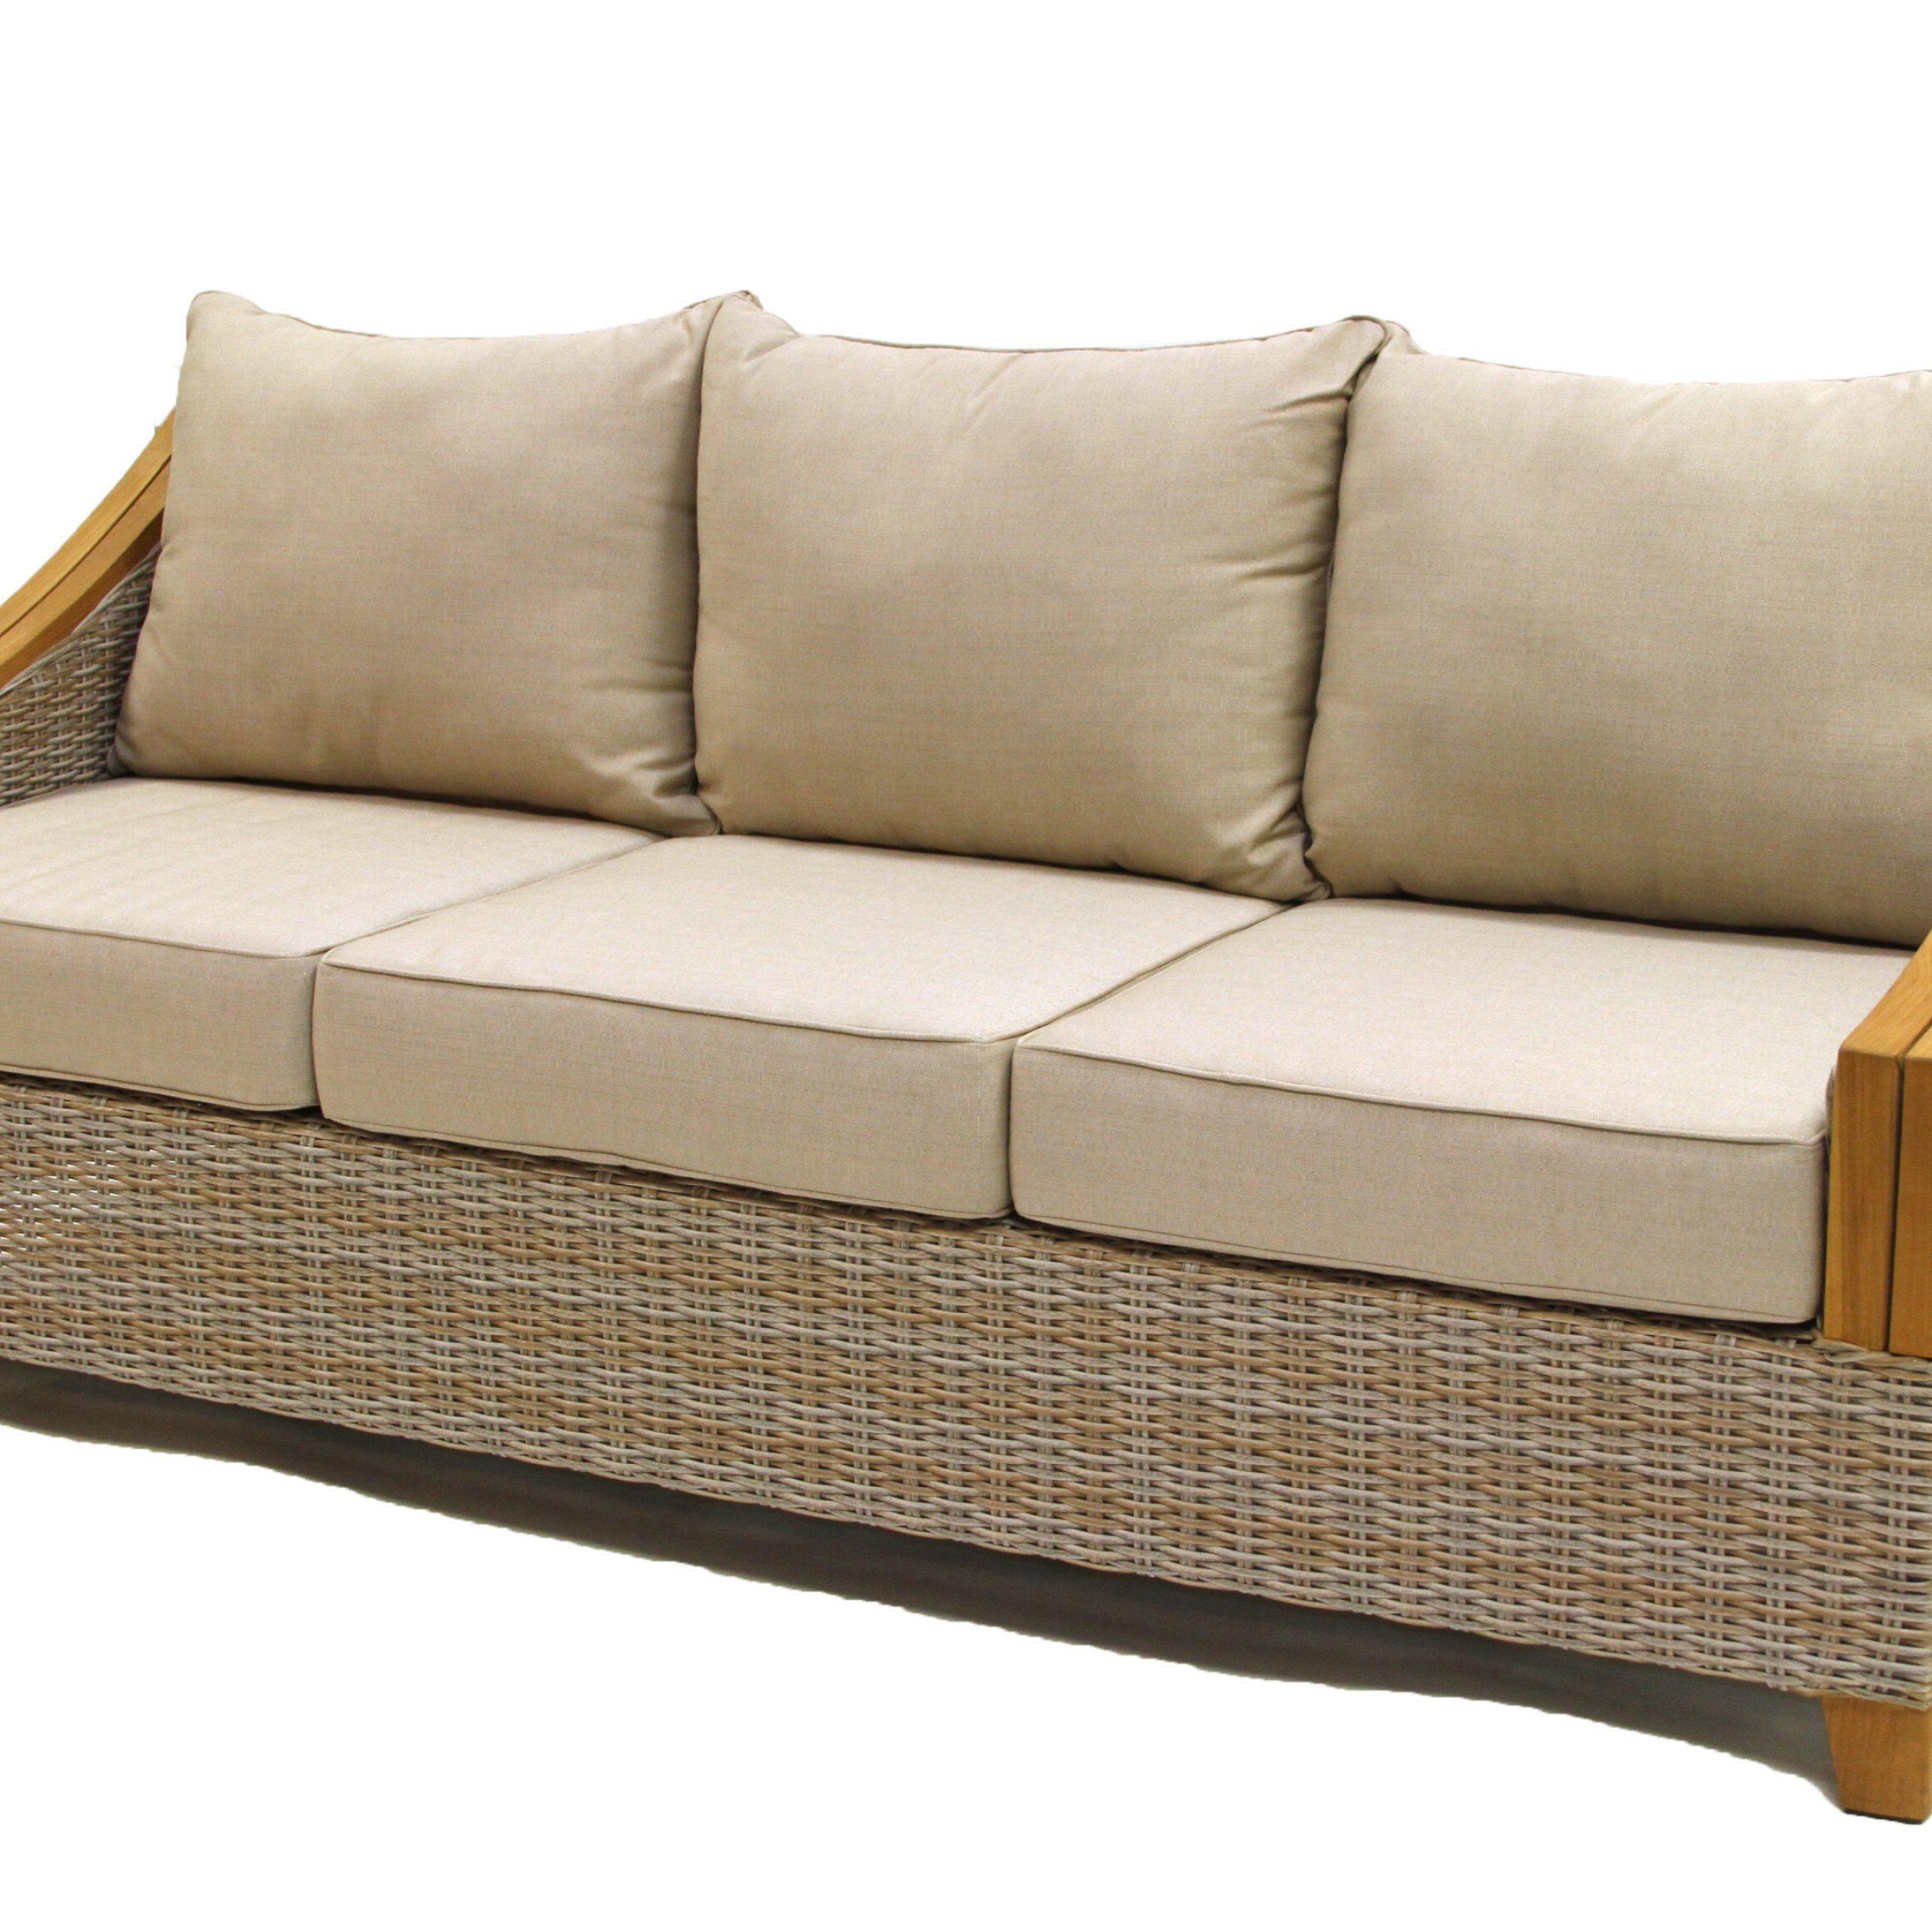 Kincaid Teak Patio Sofa With Sunbrella Cushions Pertaining To Best And Newest Kincaid Teak Patio Sofas With Sunbrella Cushions (View 2 of 25)